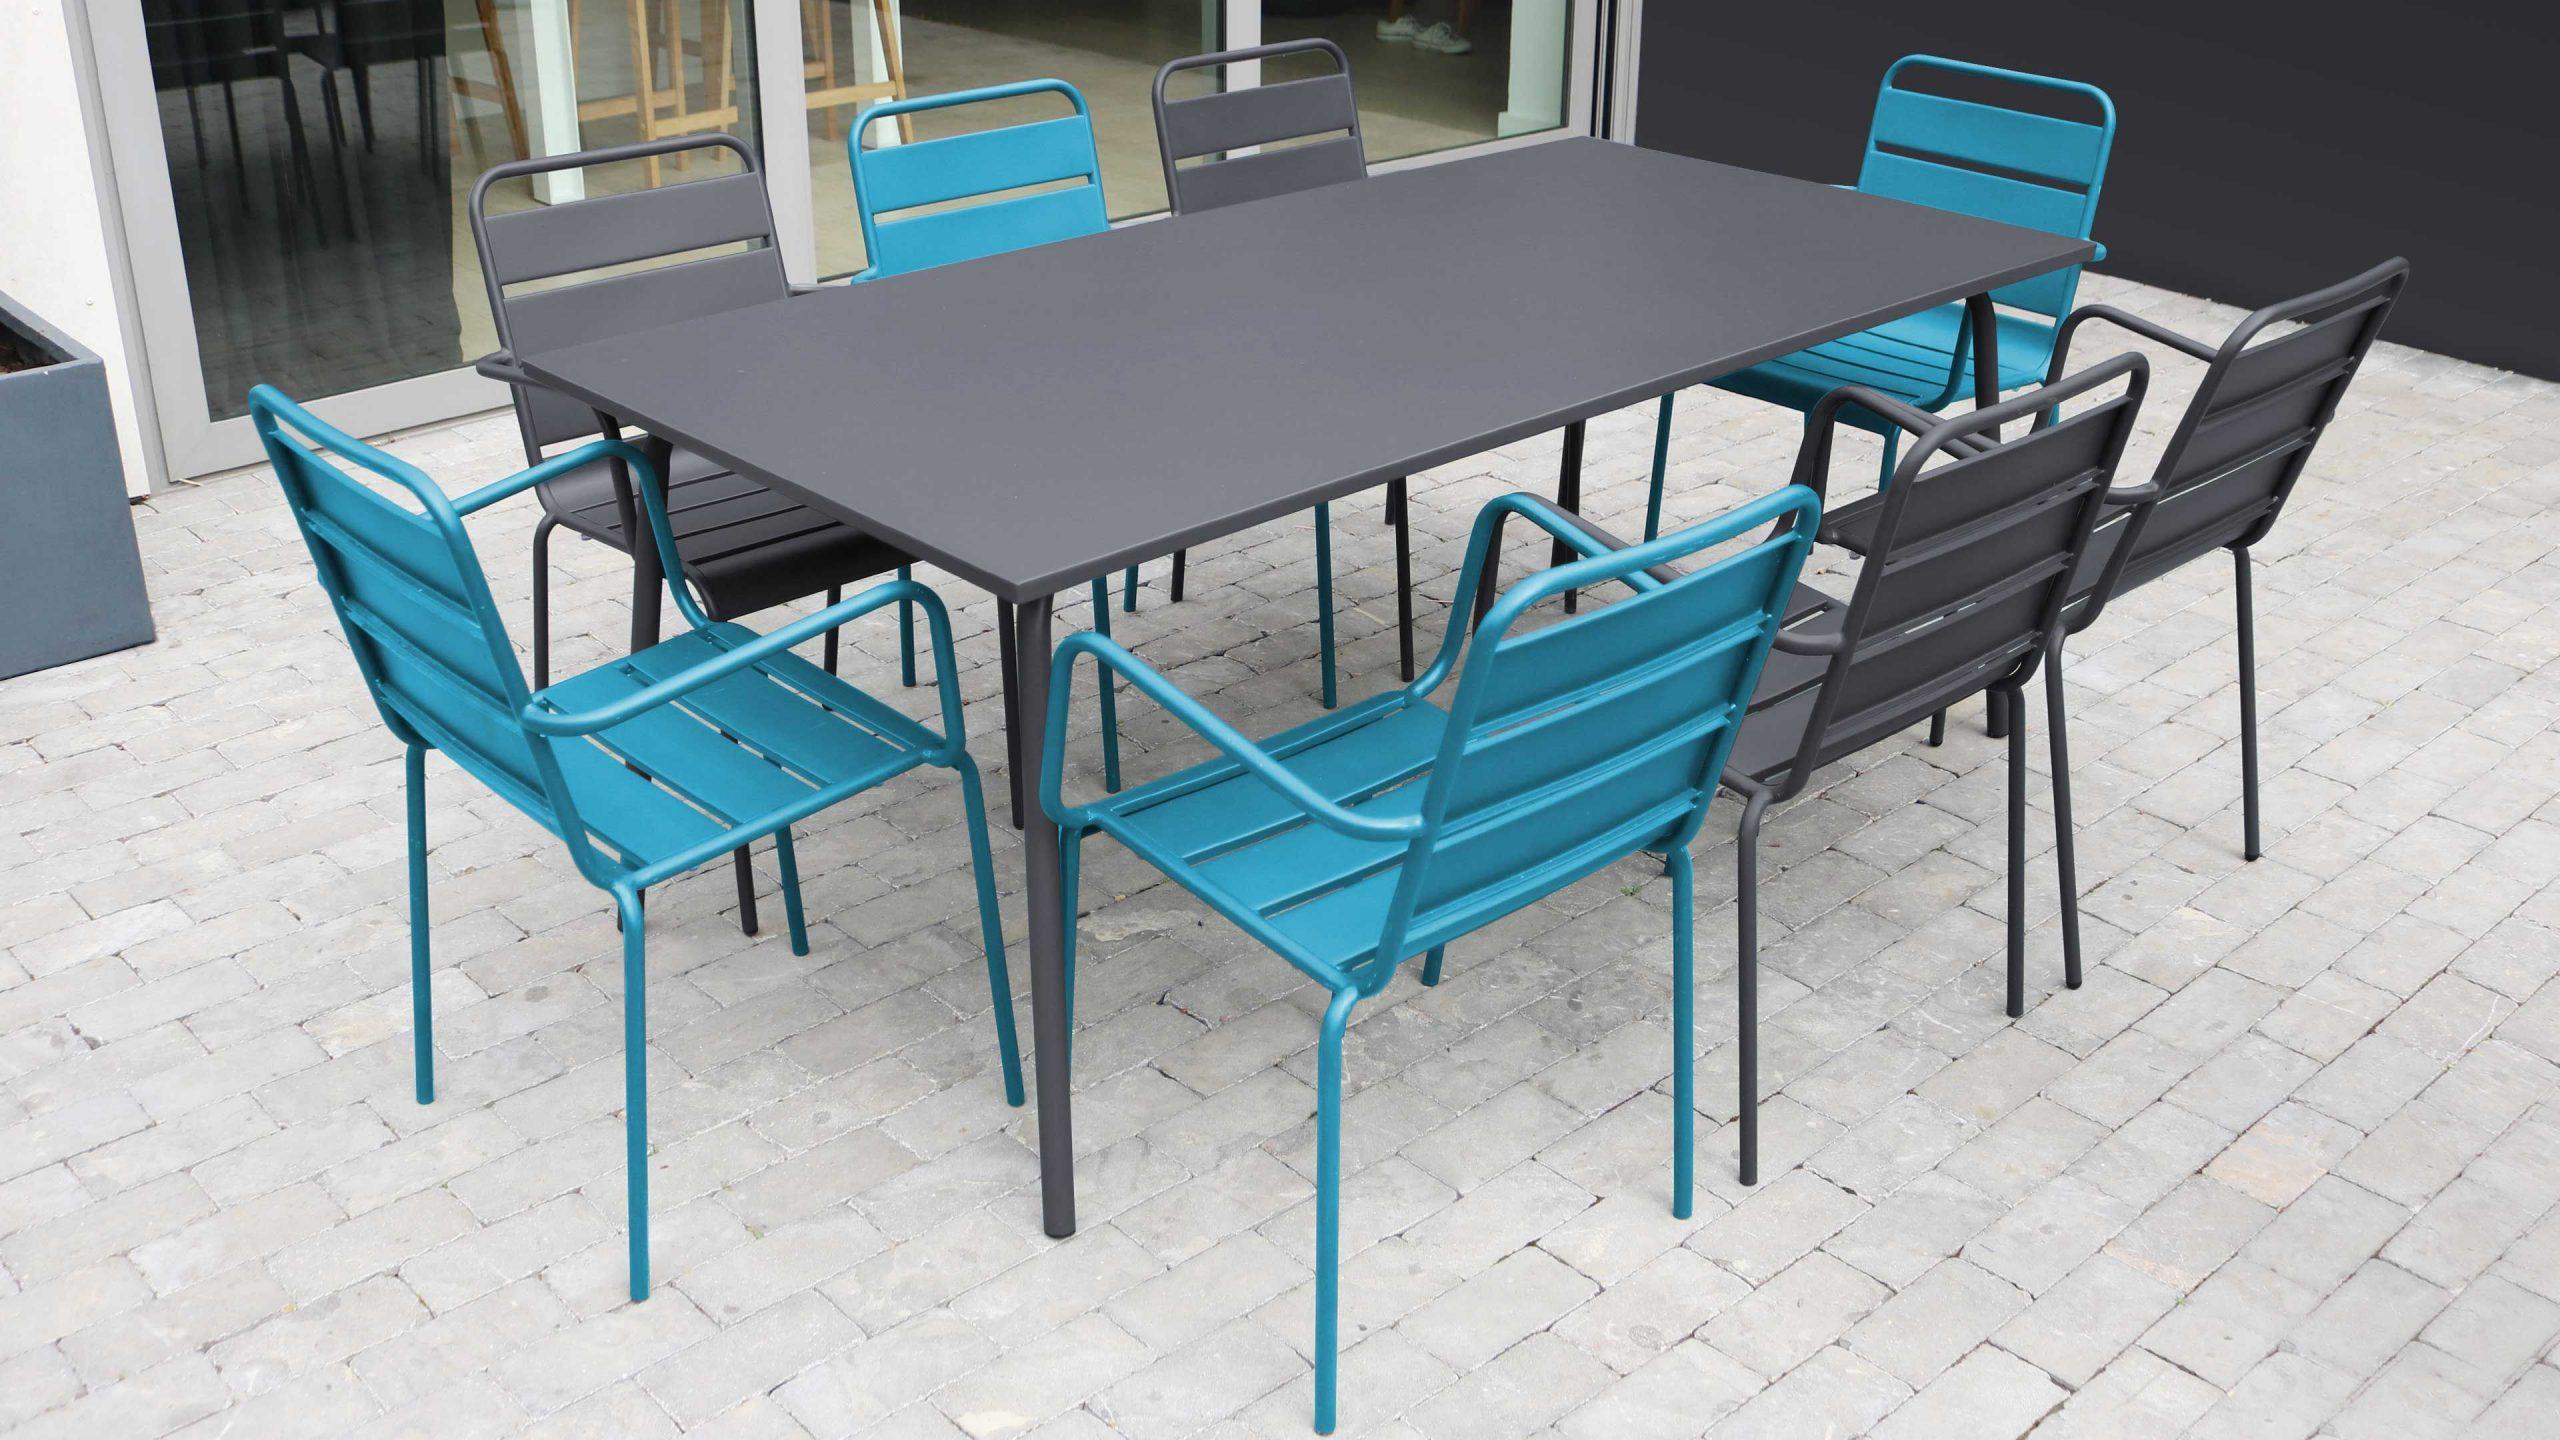 Salon De Jardin Metal Table Et Fauteuils concernant Salon De Jardin Métal Coloré